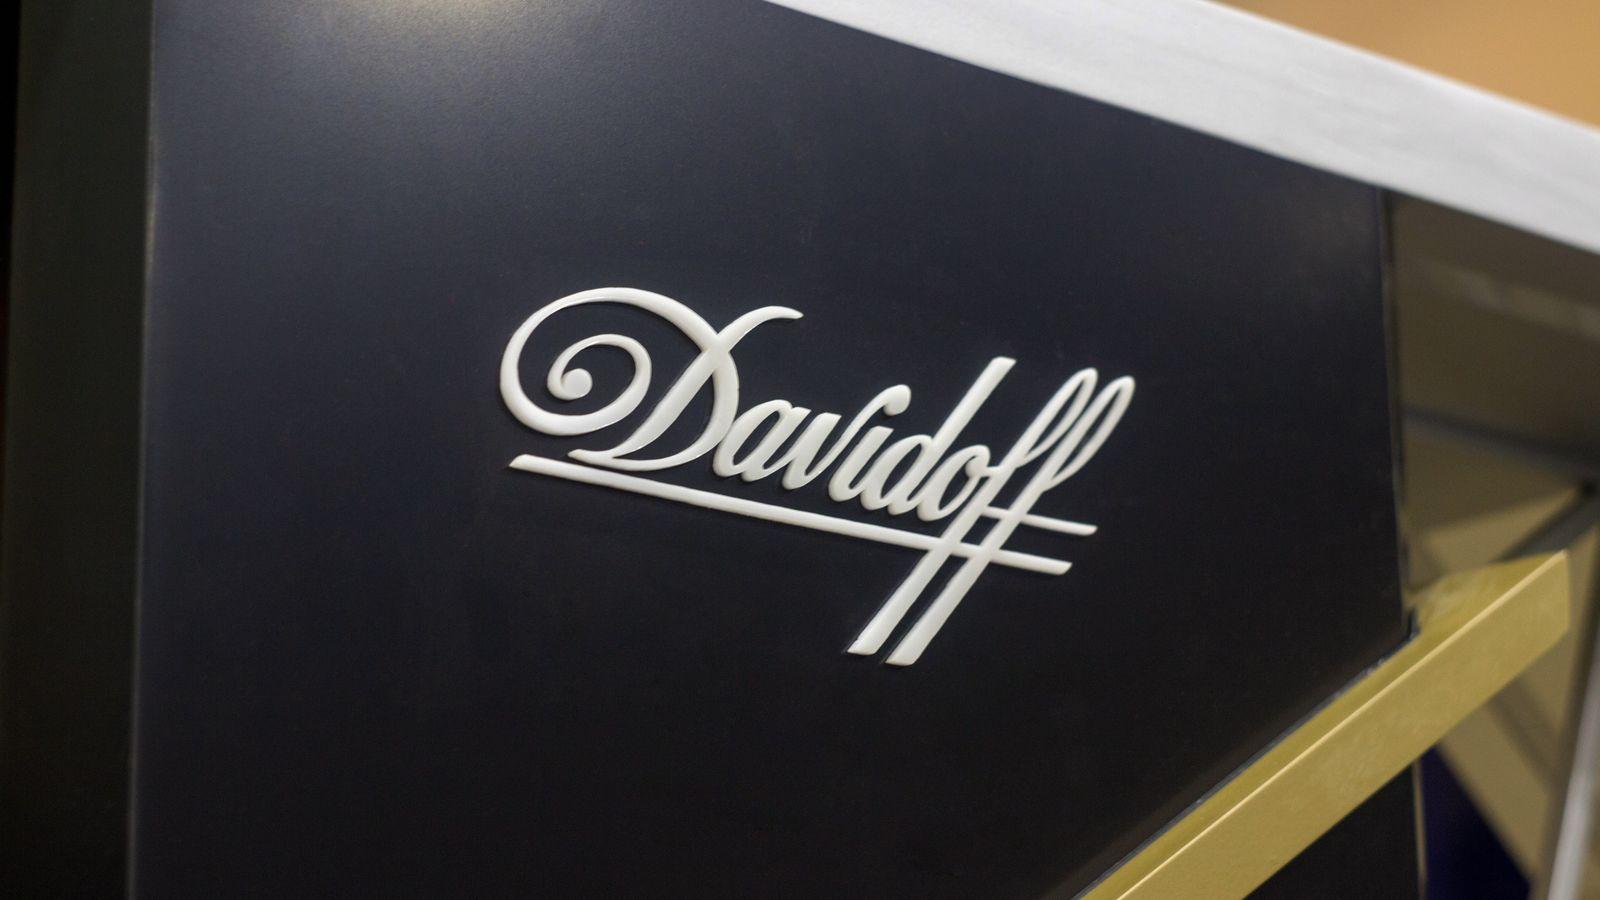 Davidoff acrylic logo